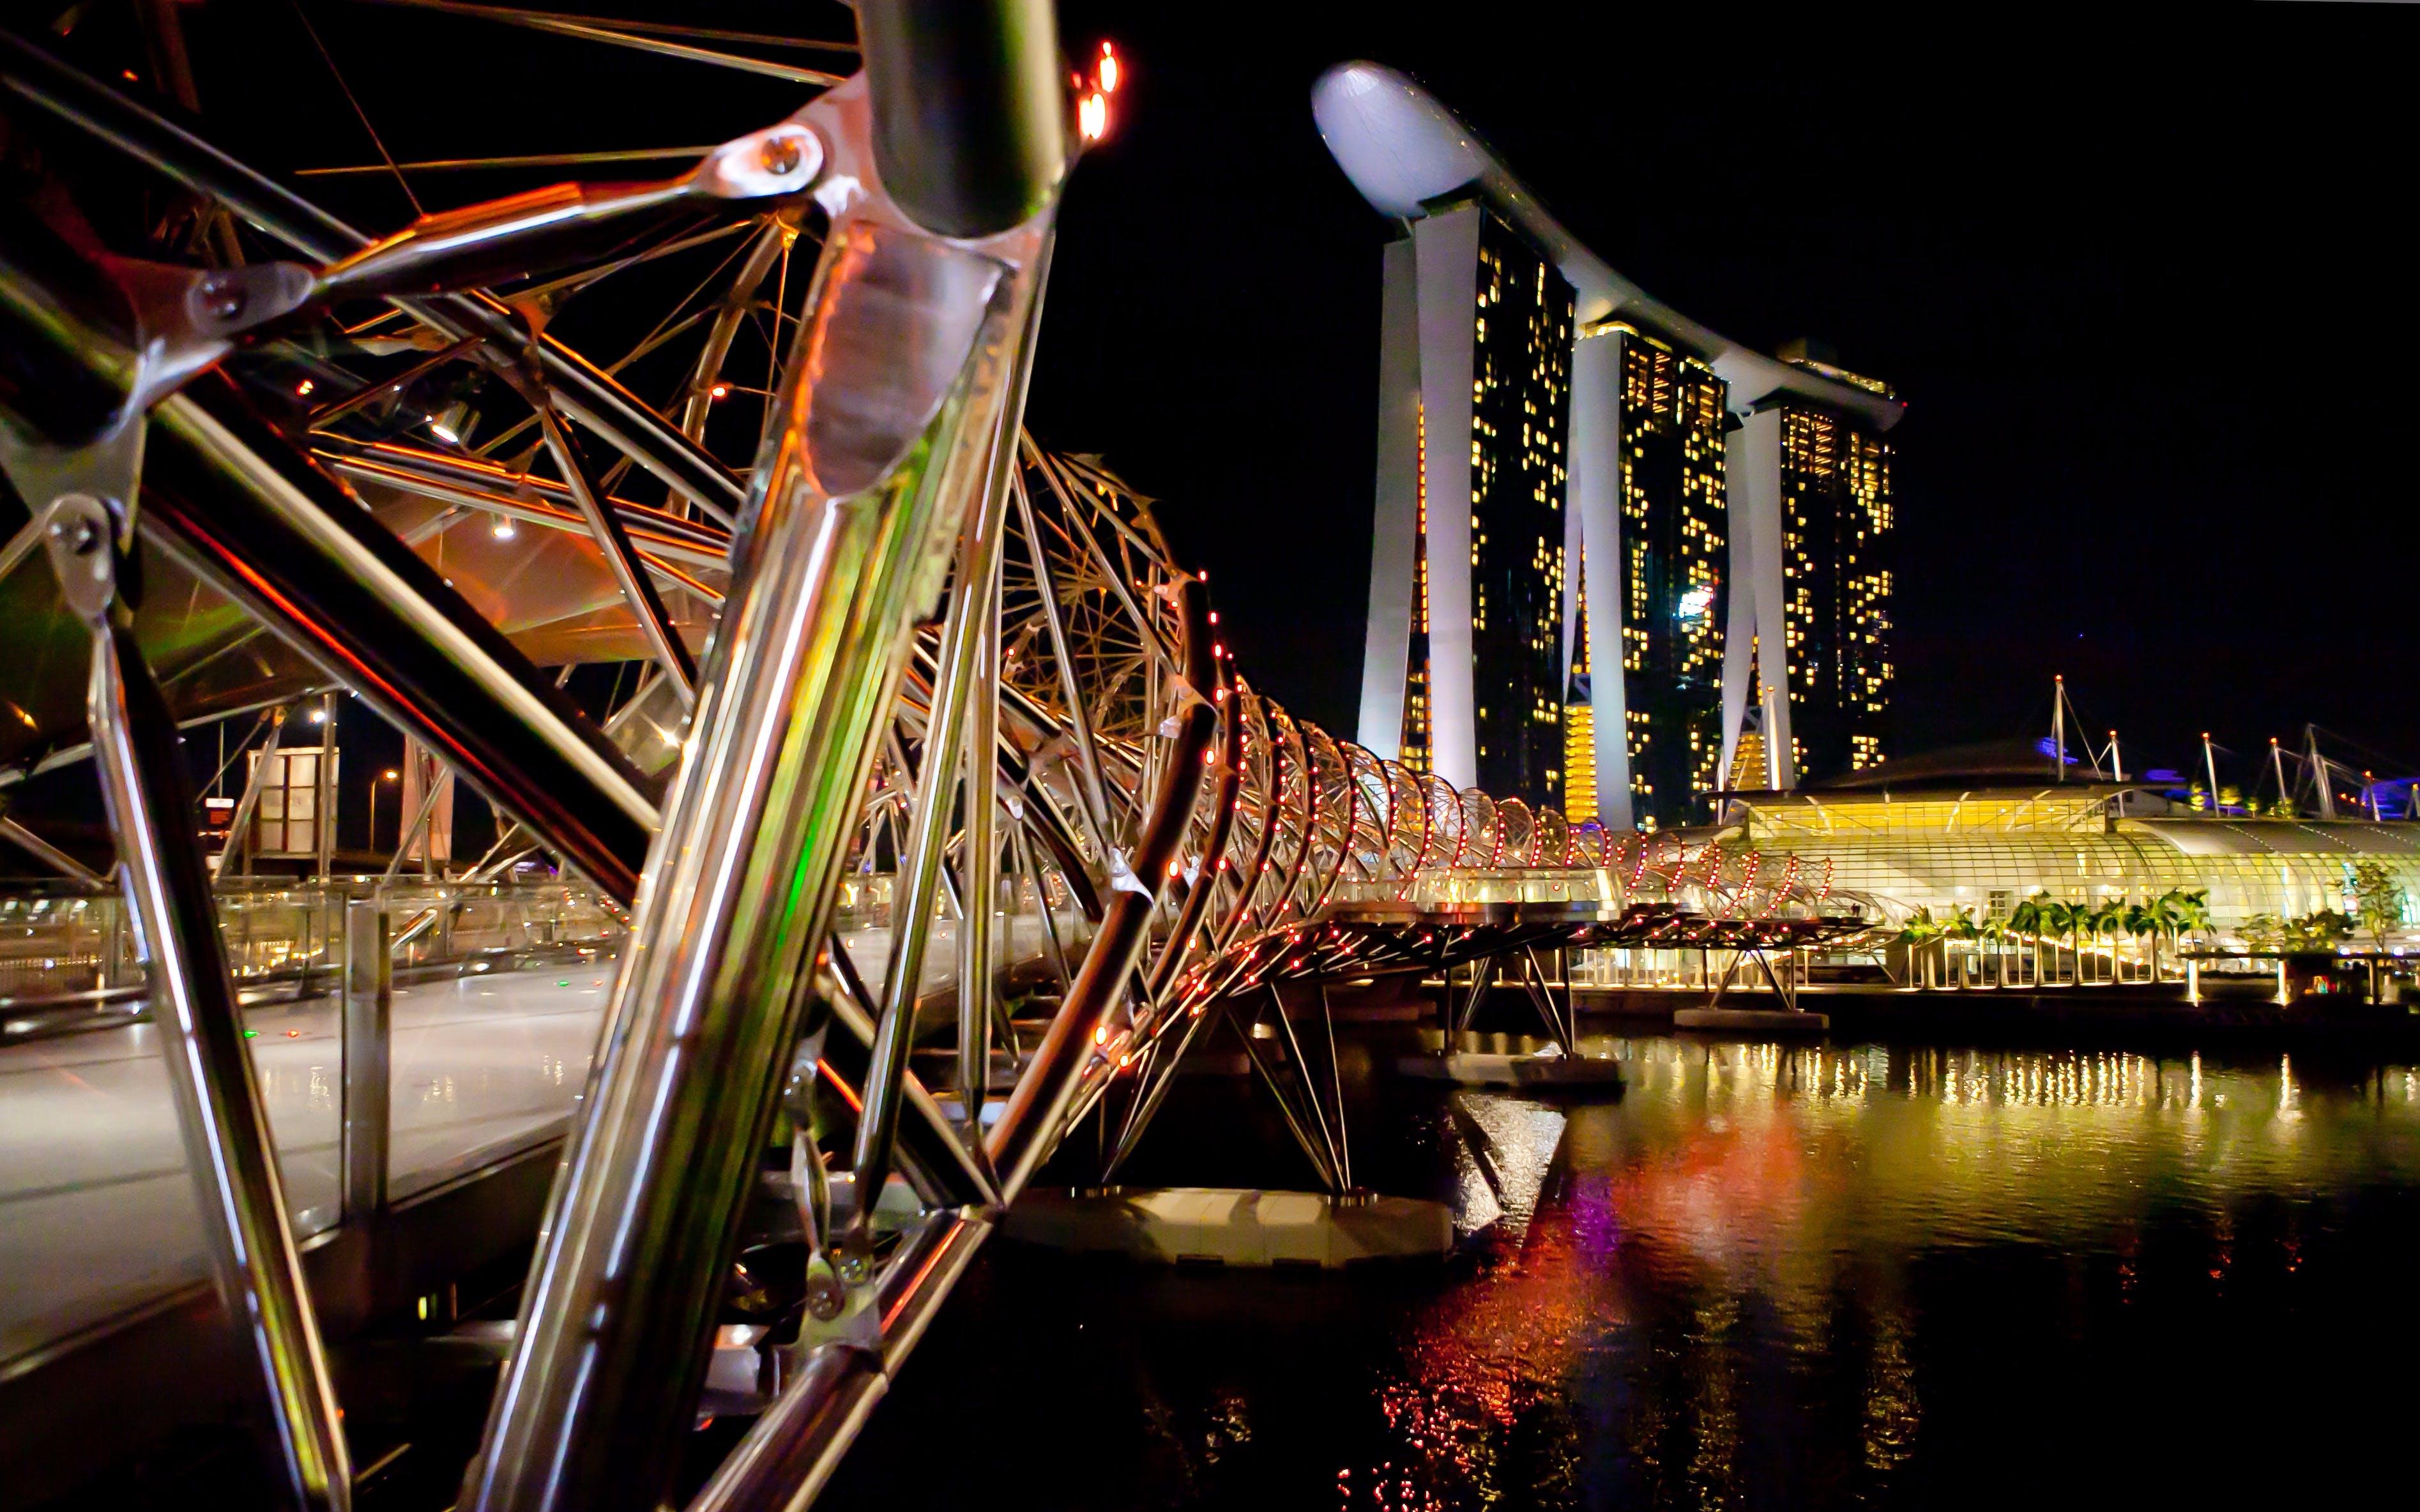 singapore hop on hop off - funvee night tour